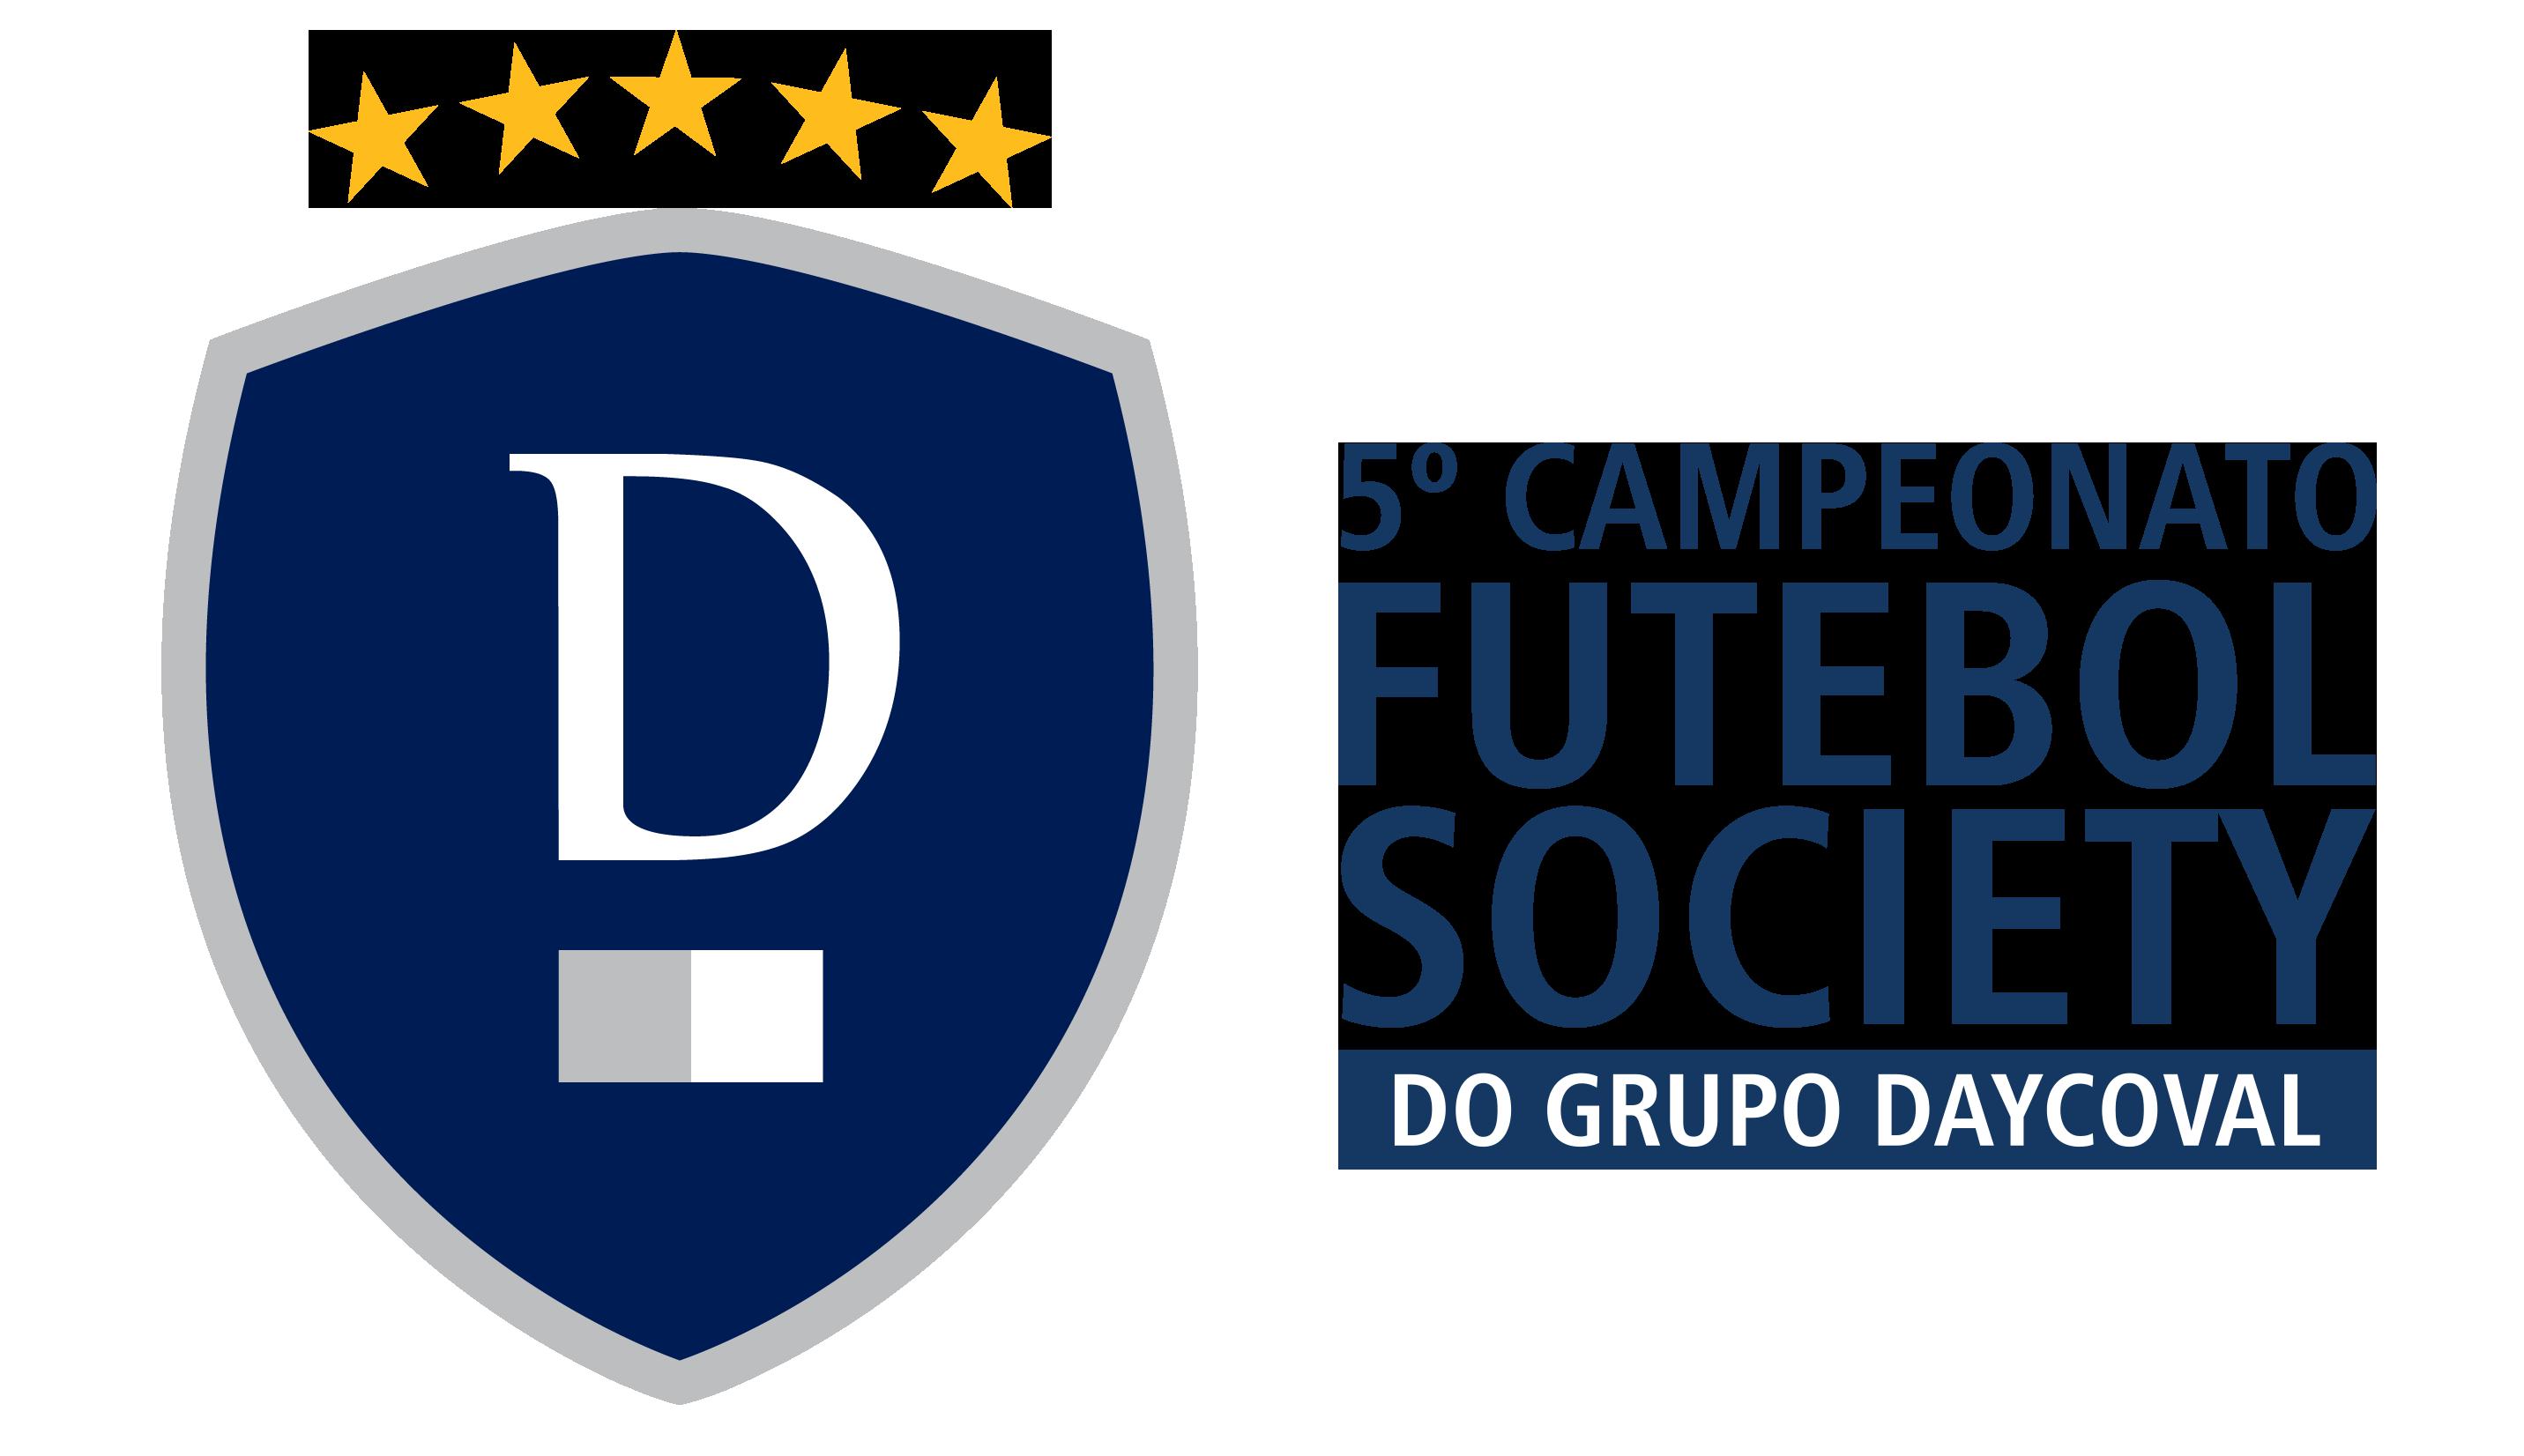 V Campeonato de Futebol Society Banco Daycoval